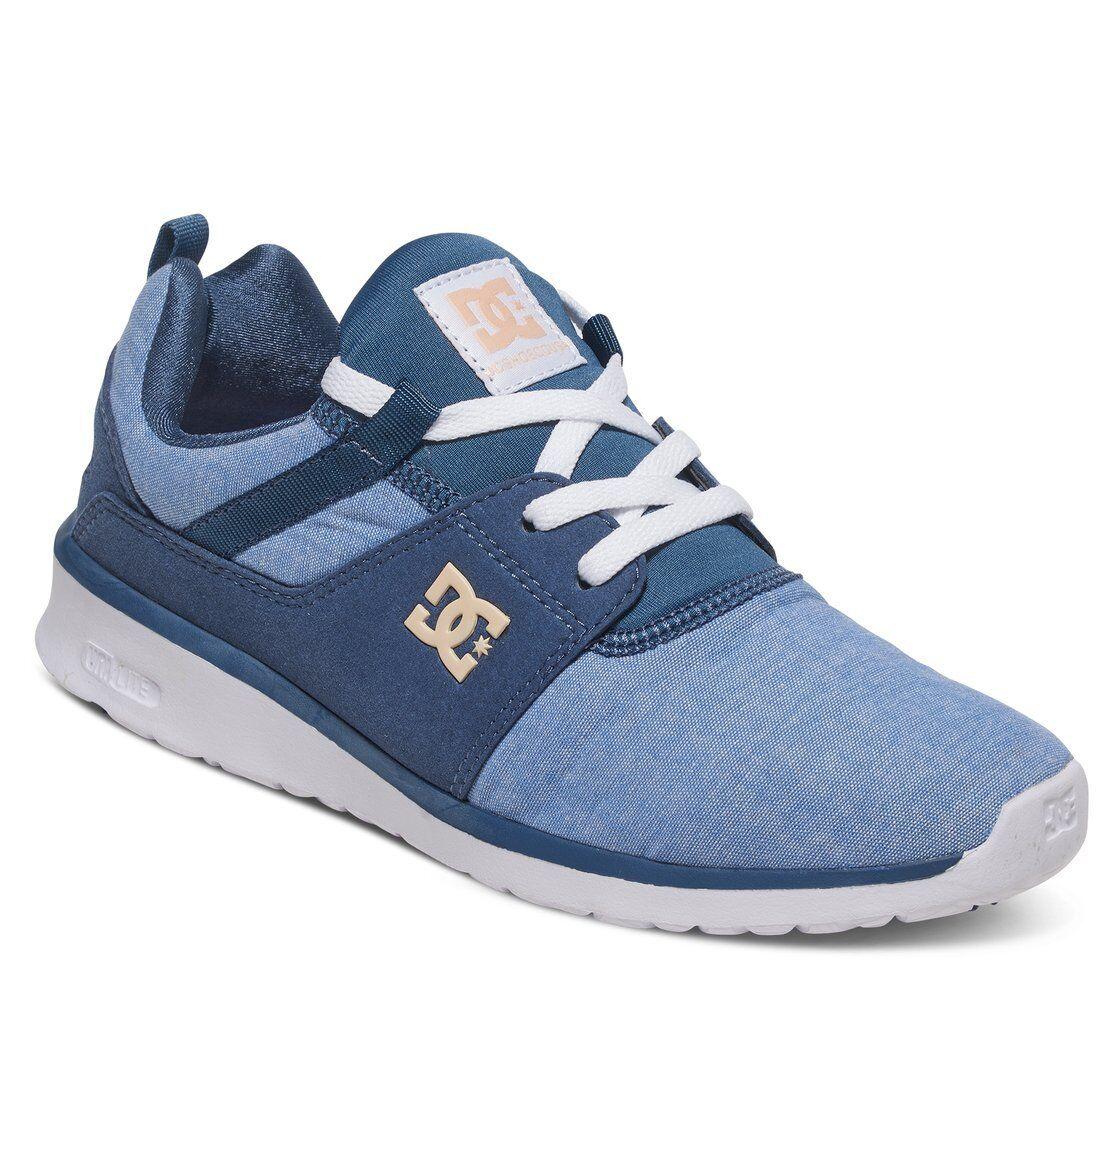 DC Schuhe Damenschuhe TRAINERS.NEW HEATHROW SE Blau SPORT ATHLETIC GYM Schuhe 7S/22/NWH